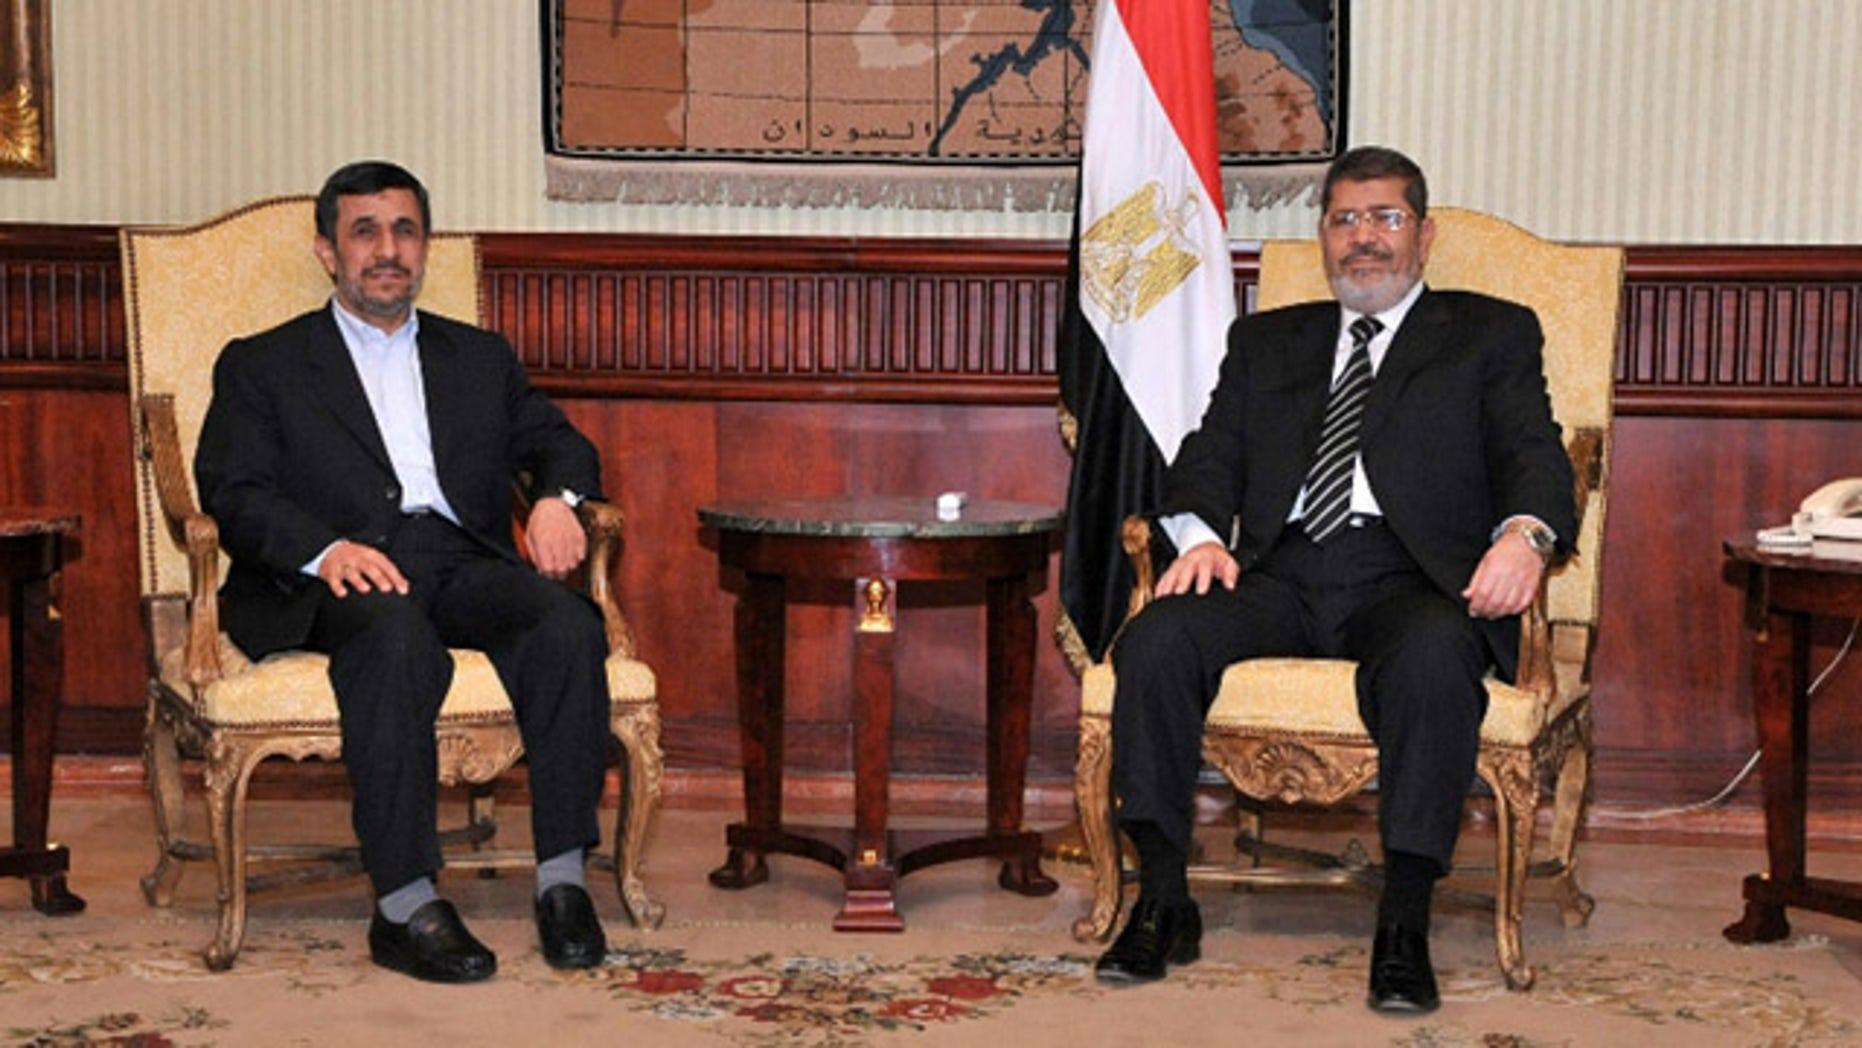 Feb. 5, 2013: Iran's President Mahmoud Ahmadinejad, left, and Egyptian President Mohammed Morsi, right, pose for photographers in Cairo, Egypt.